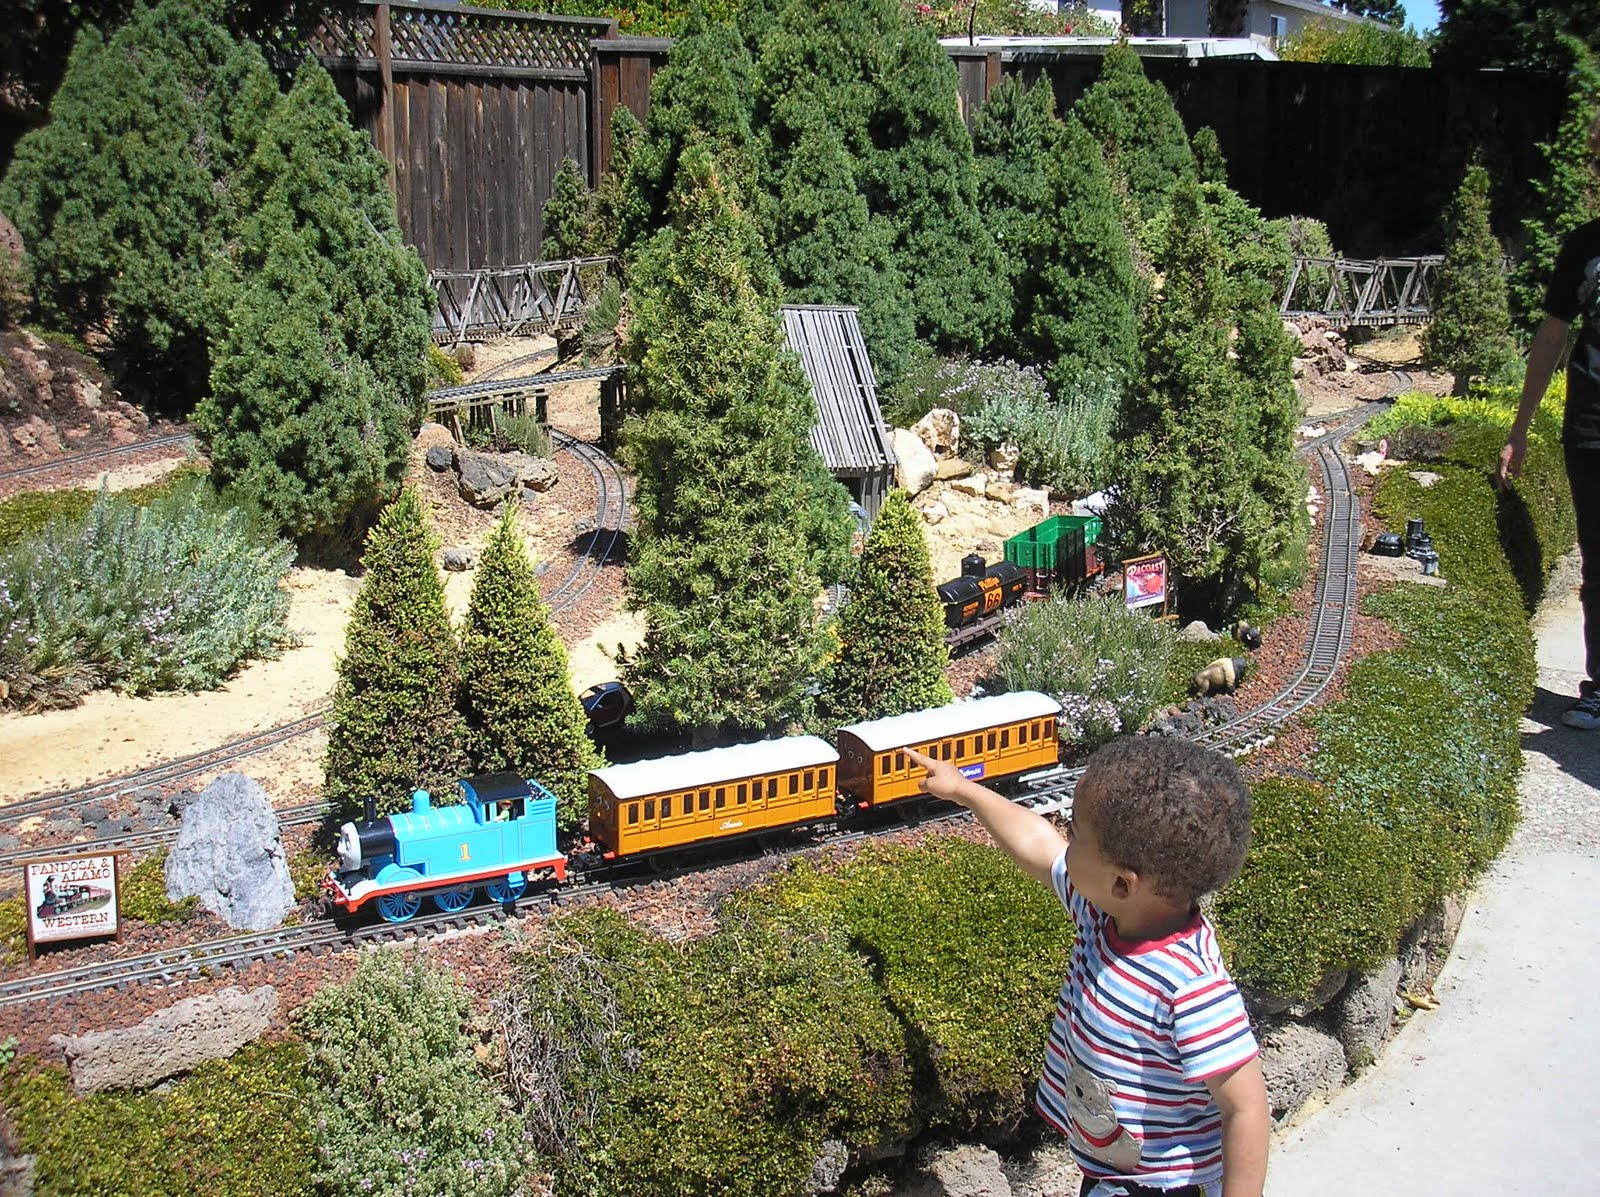 Garden railway tour garden dezine for Garden railway designs